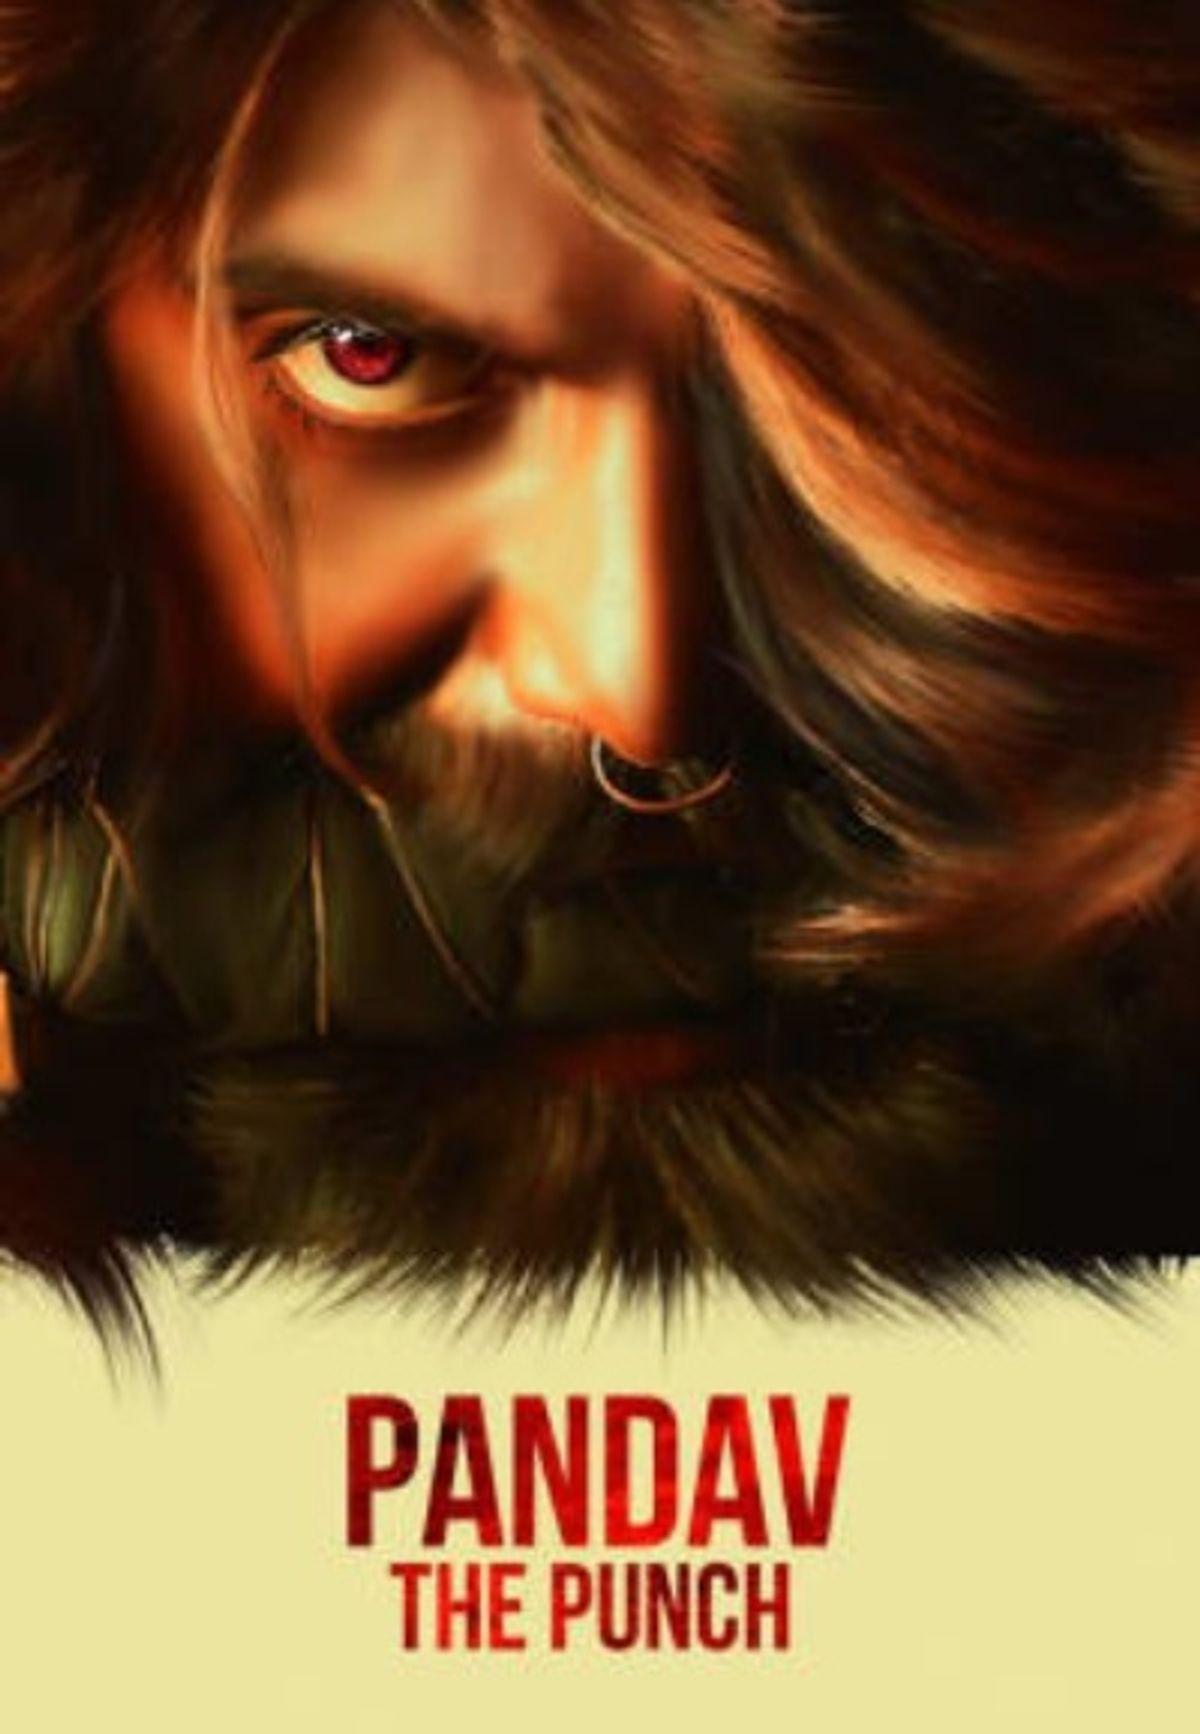 Pandav – The Punch